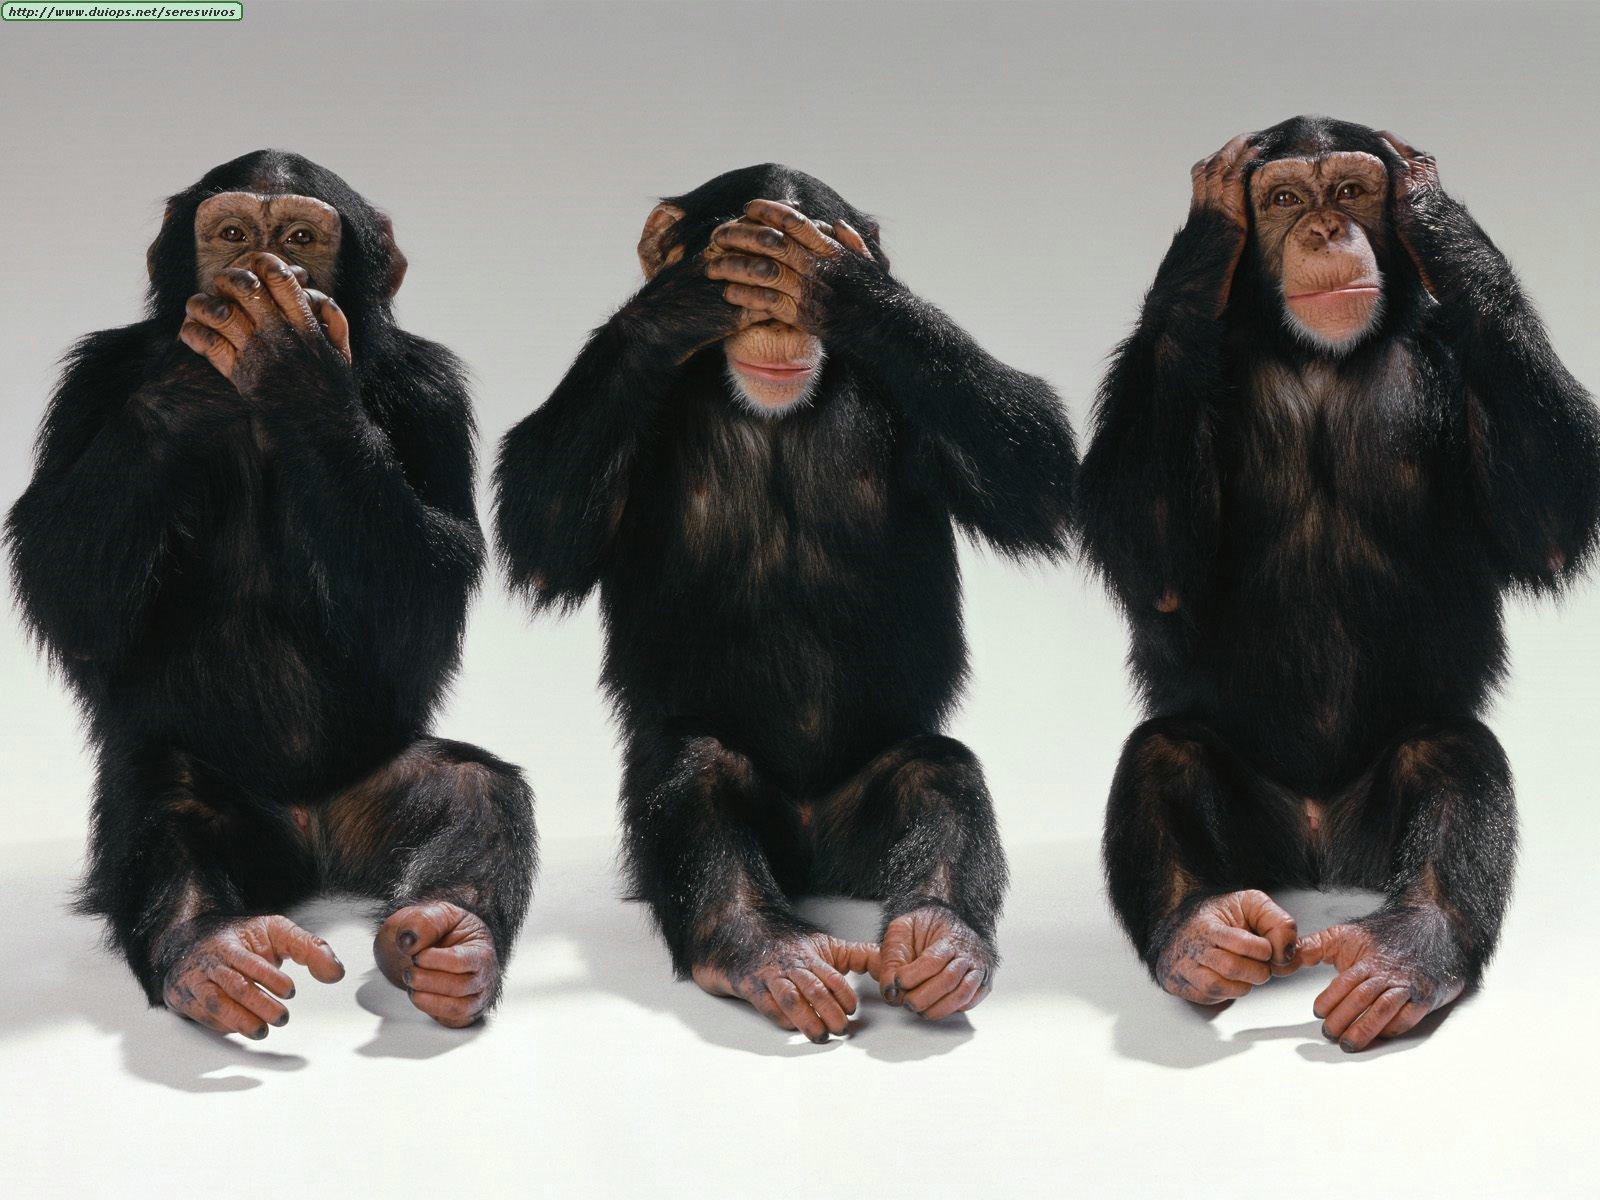 https://i1.wp.com/www.duiops.net/seresvivos/galeria/chimpances/Animals%20Chimpanzees_Hear%20No%20Evil,%20See%20No%20Evil,%20Speak%20No%20Evil.jpg